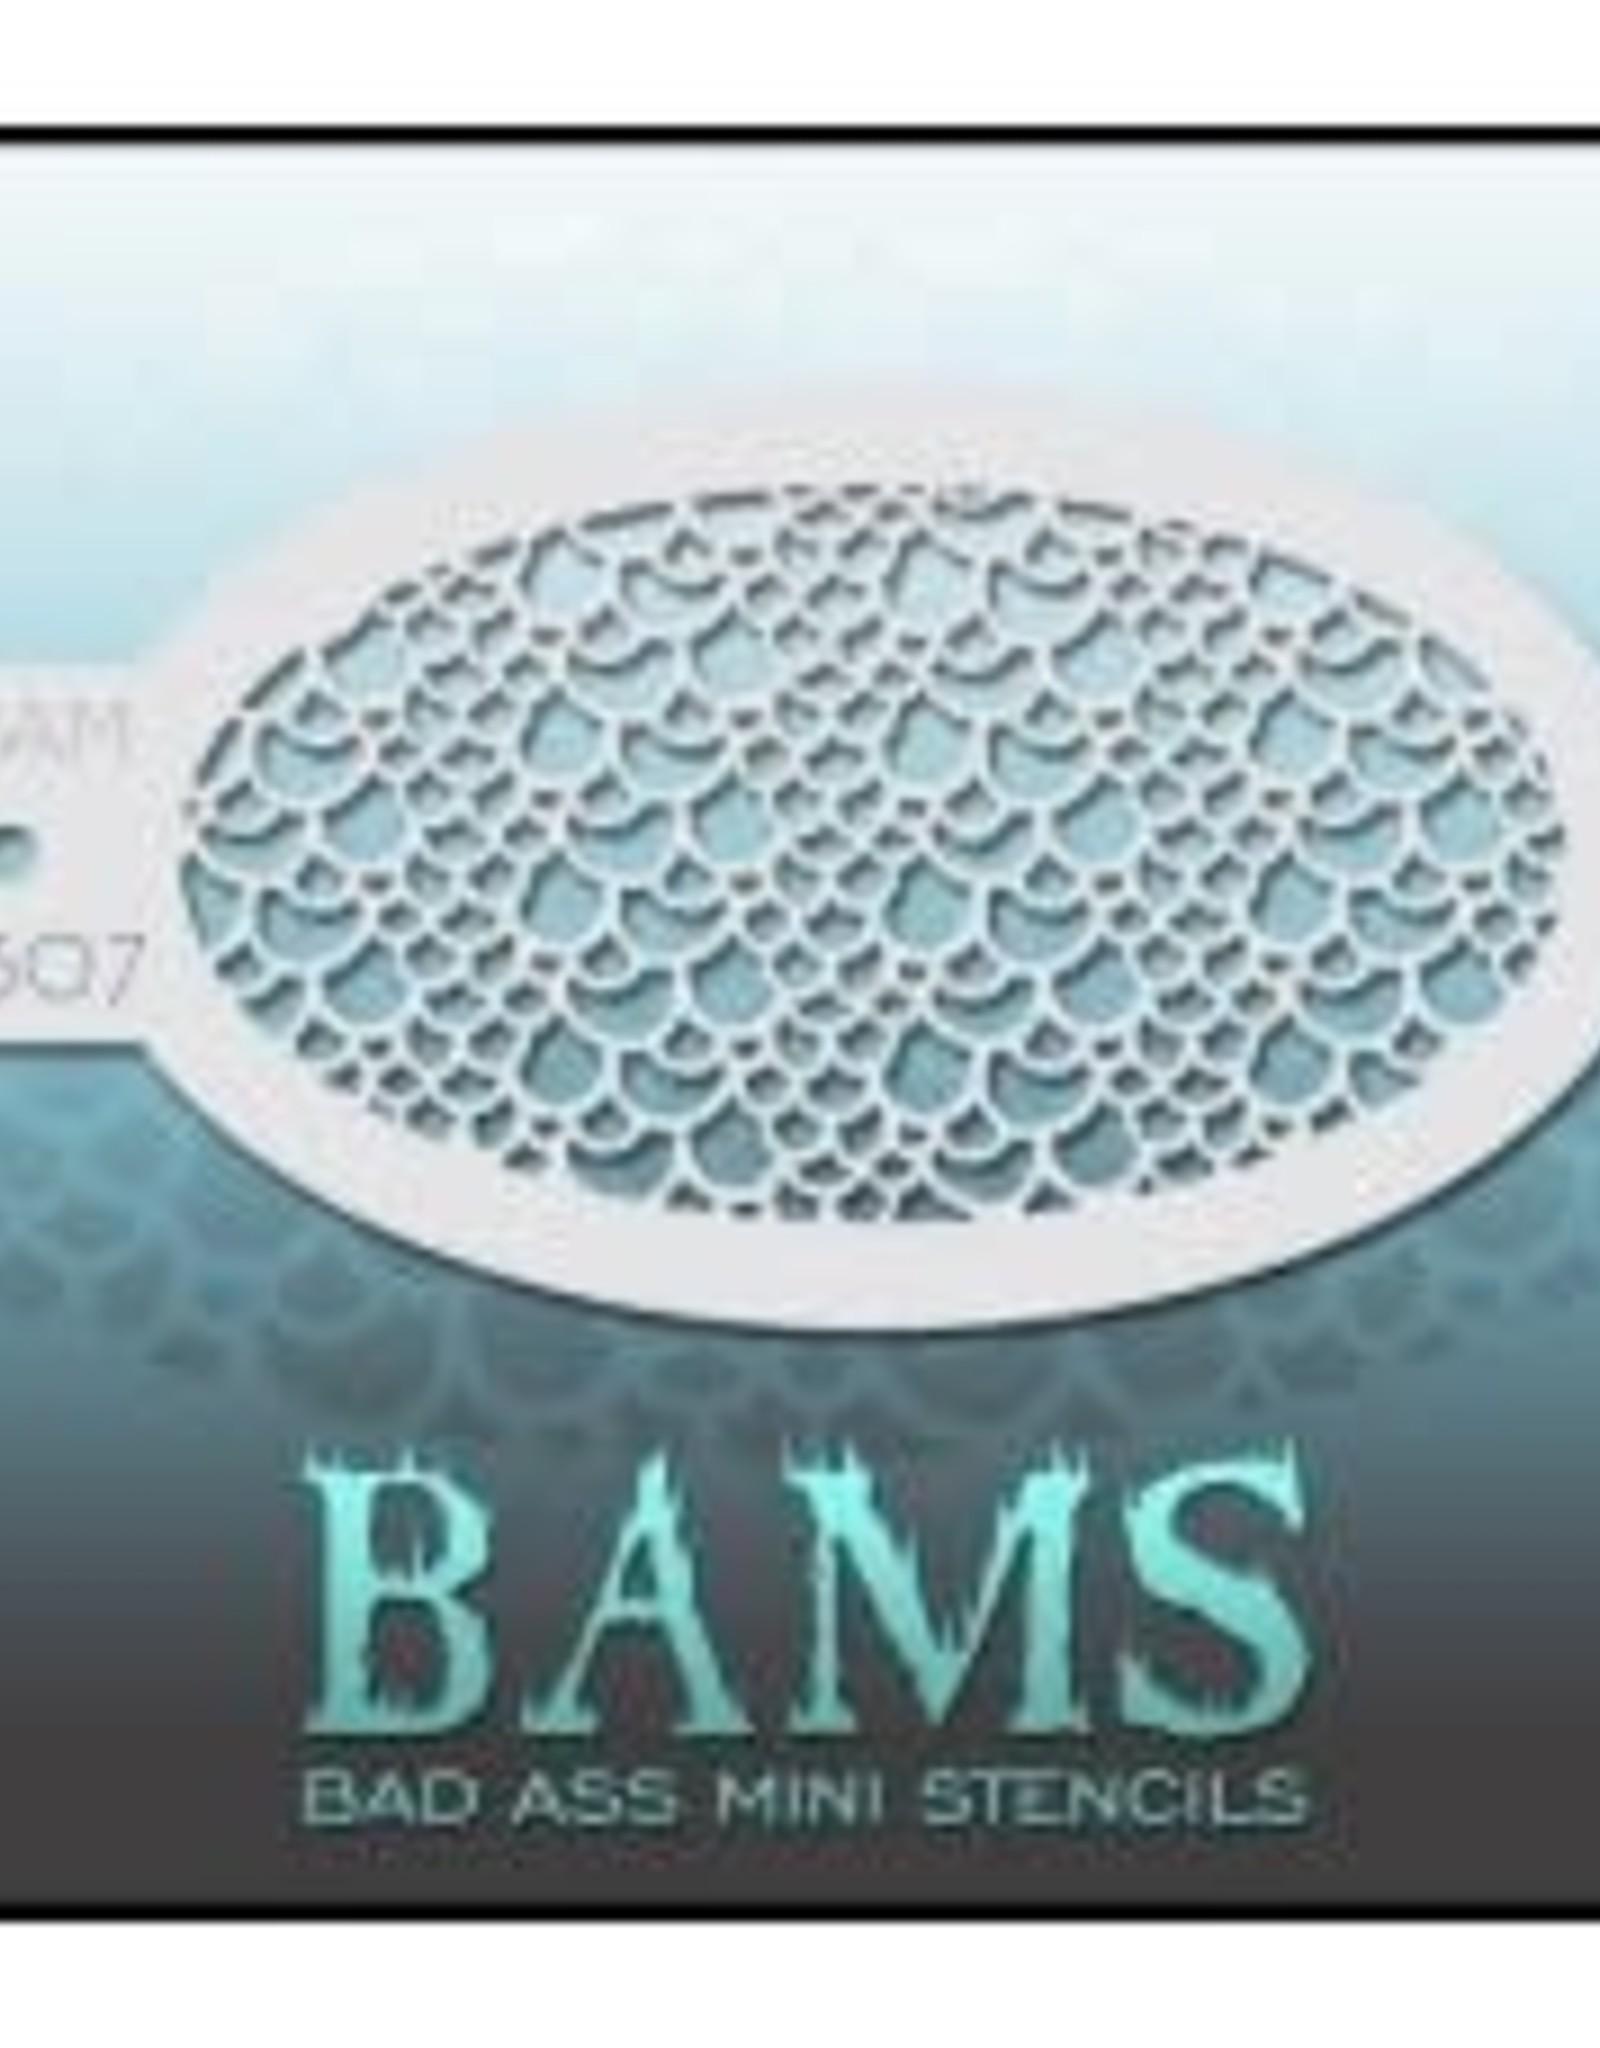 Bad Ass Stencils Bad Ass Mini Stencil - BAM1307